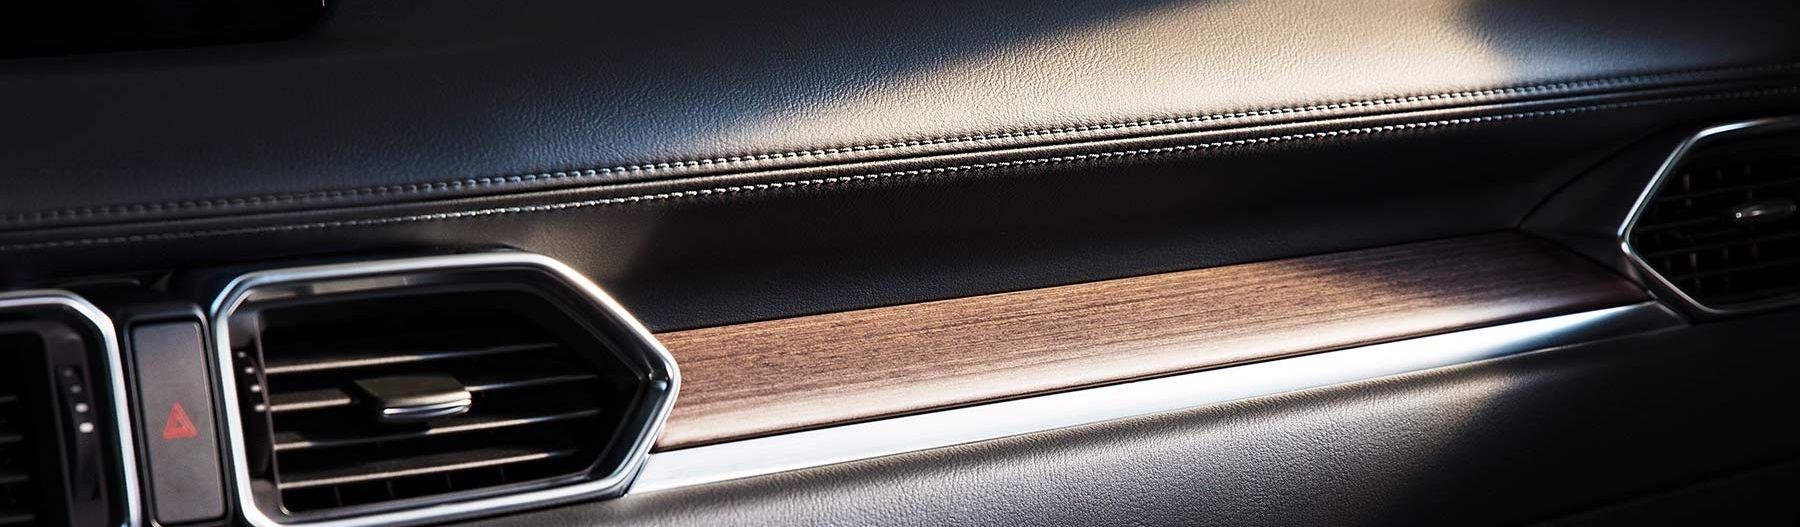 Stunning Trim in the 2019 Mazda CX-5